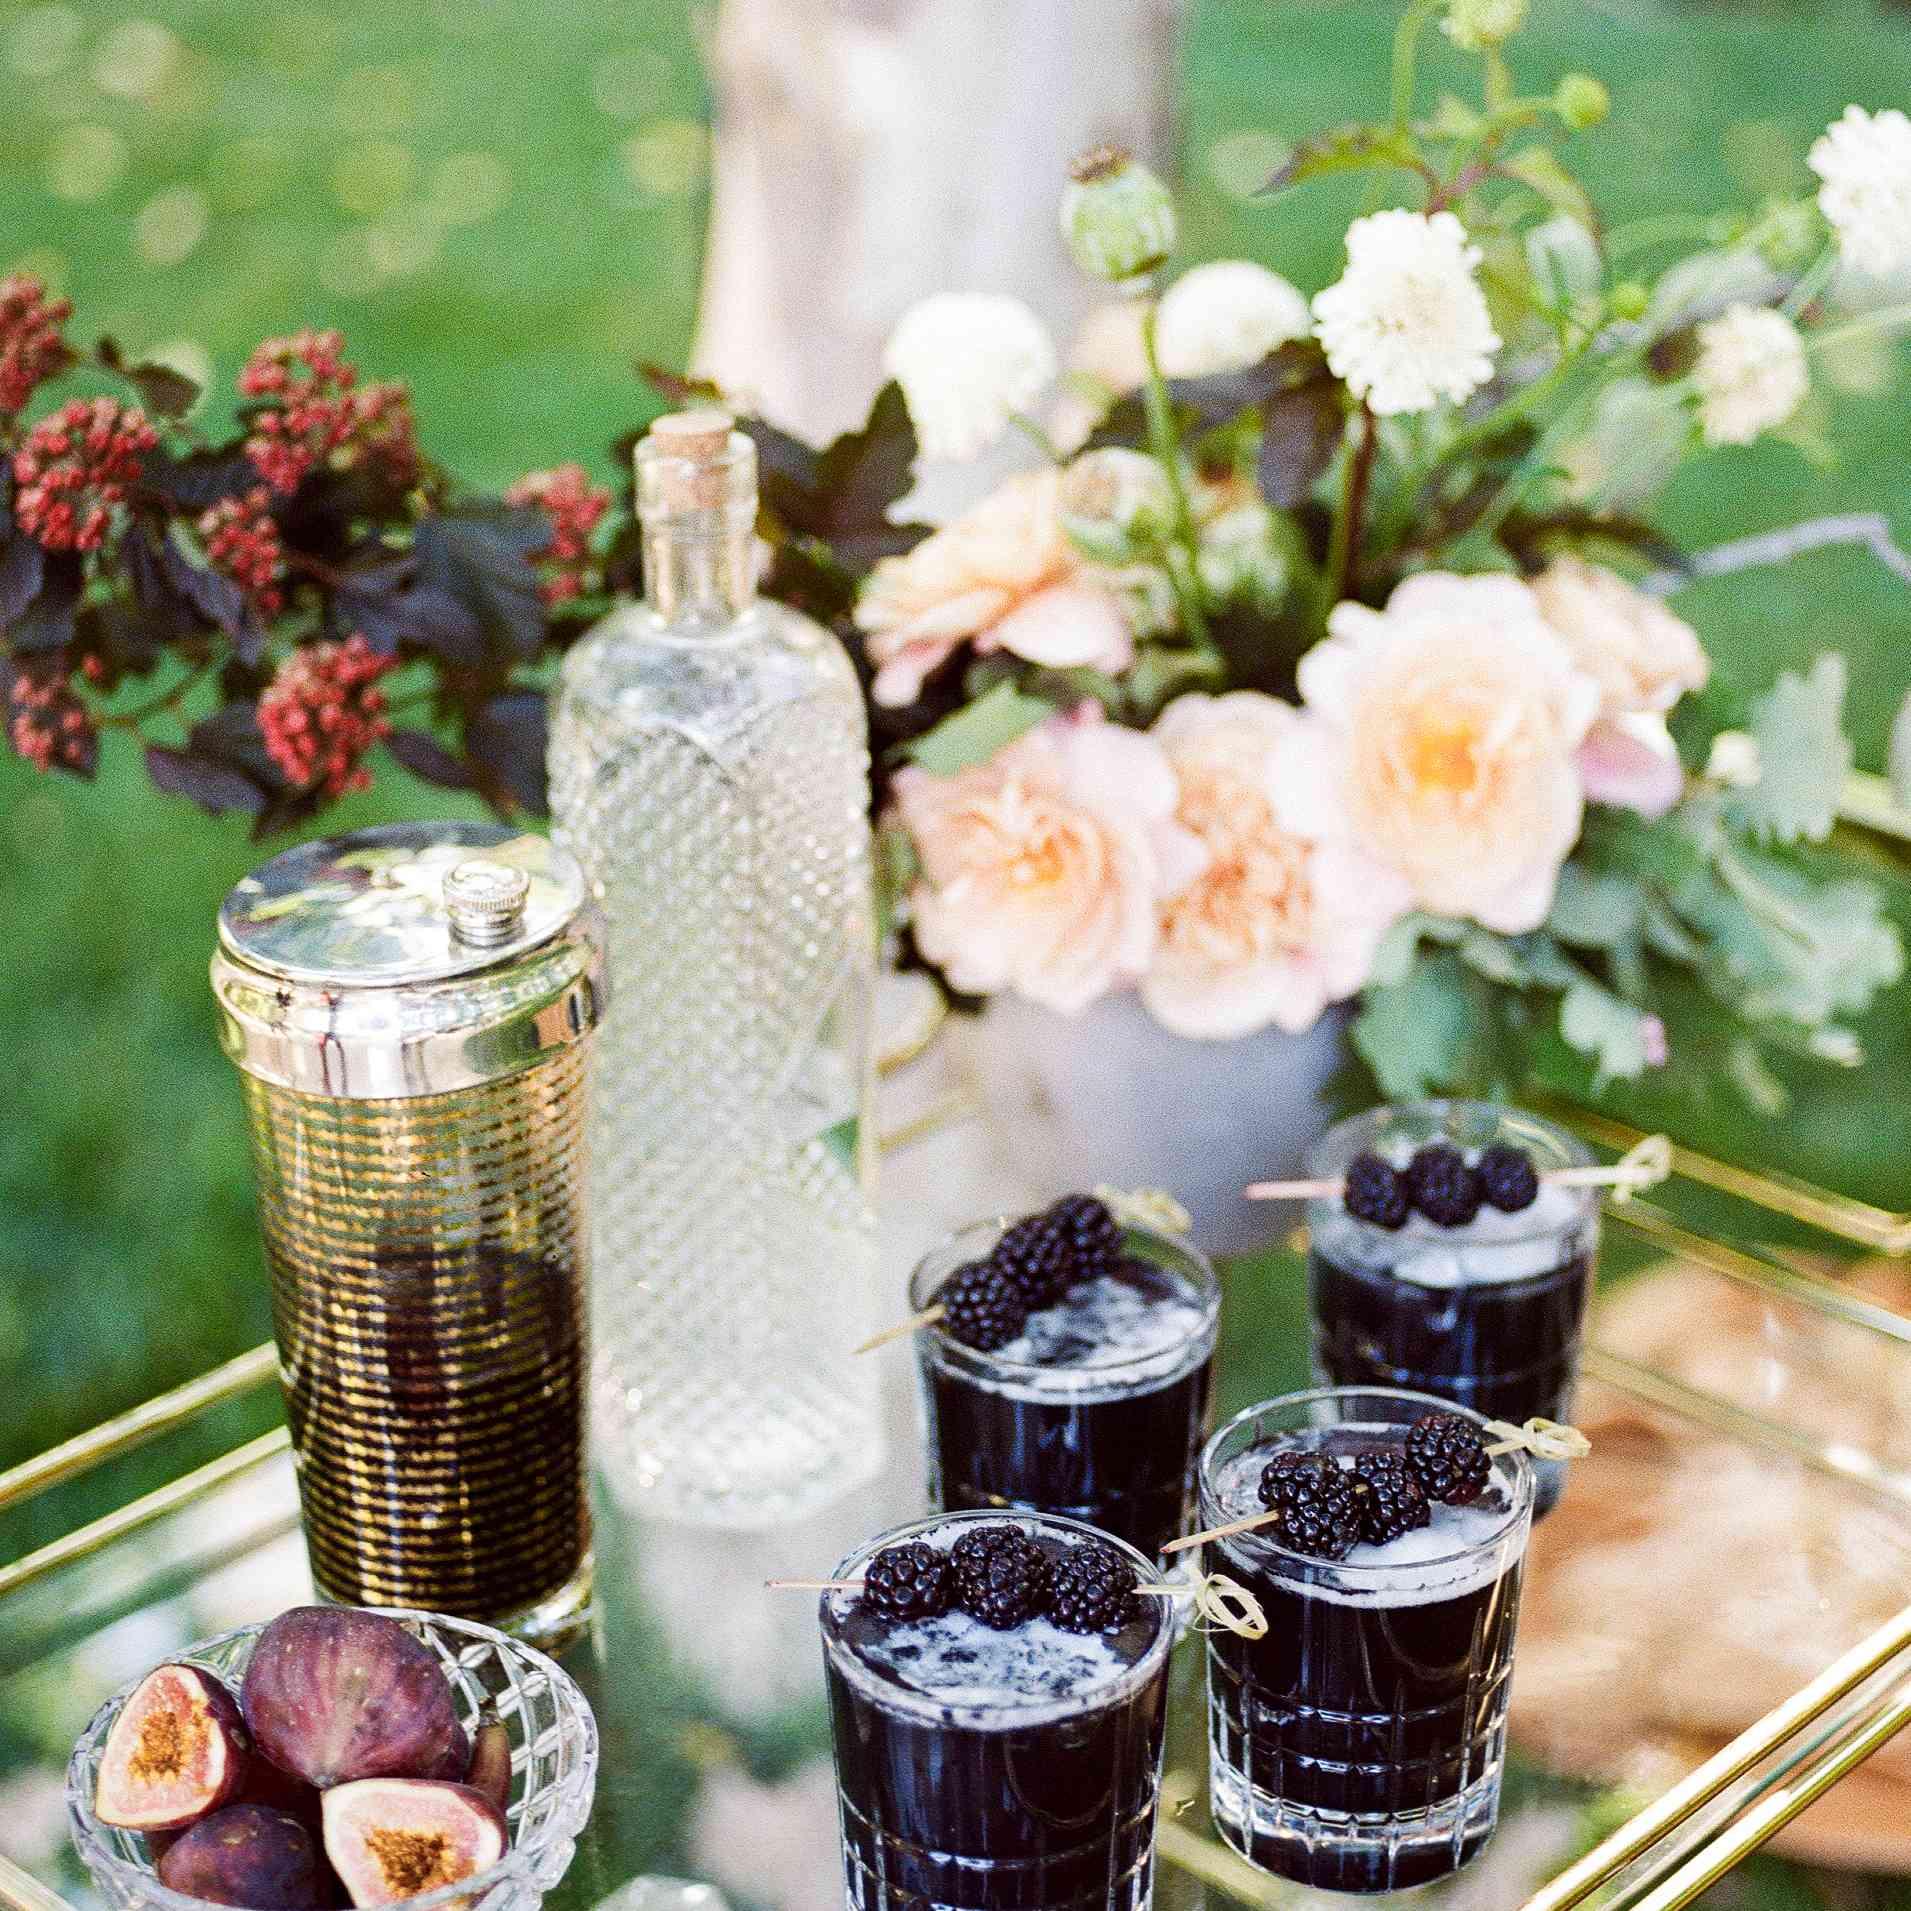 Blackberry-infused cocktails and floral arrangement on a glass bar cart